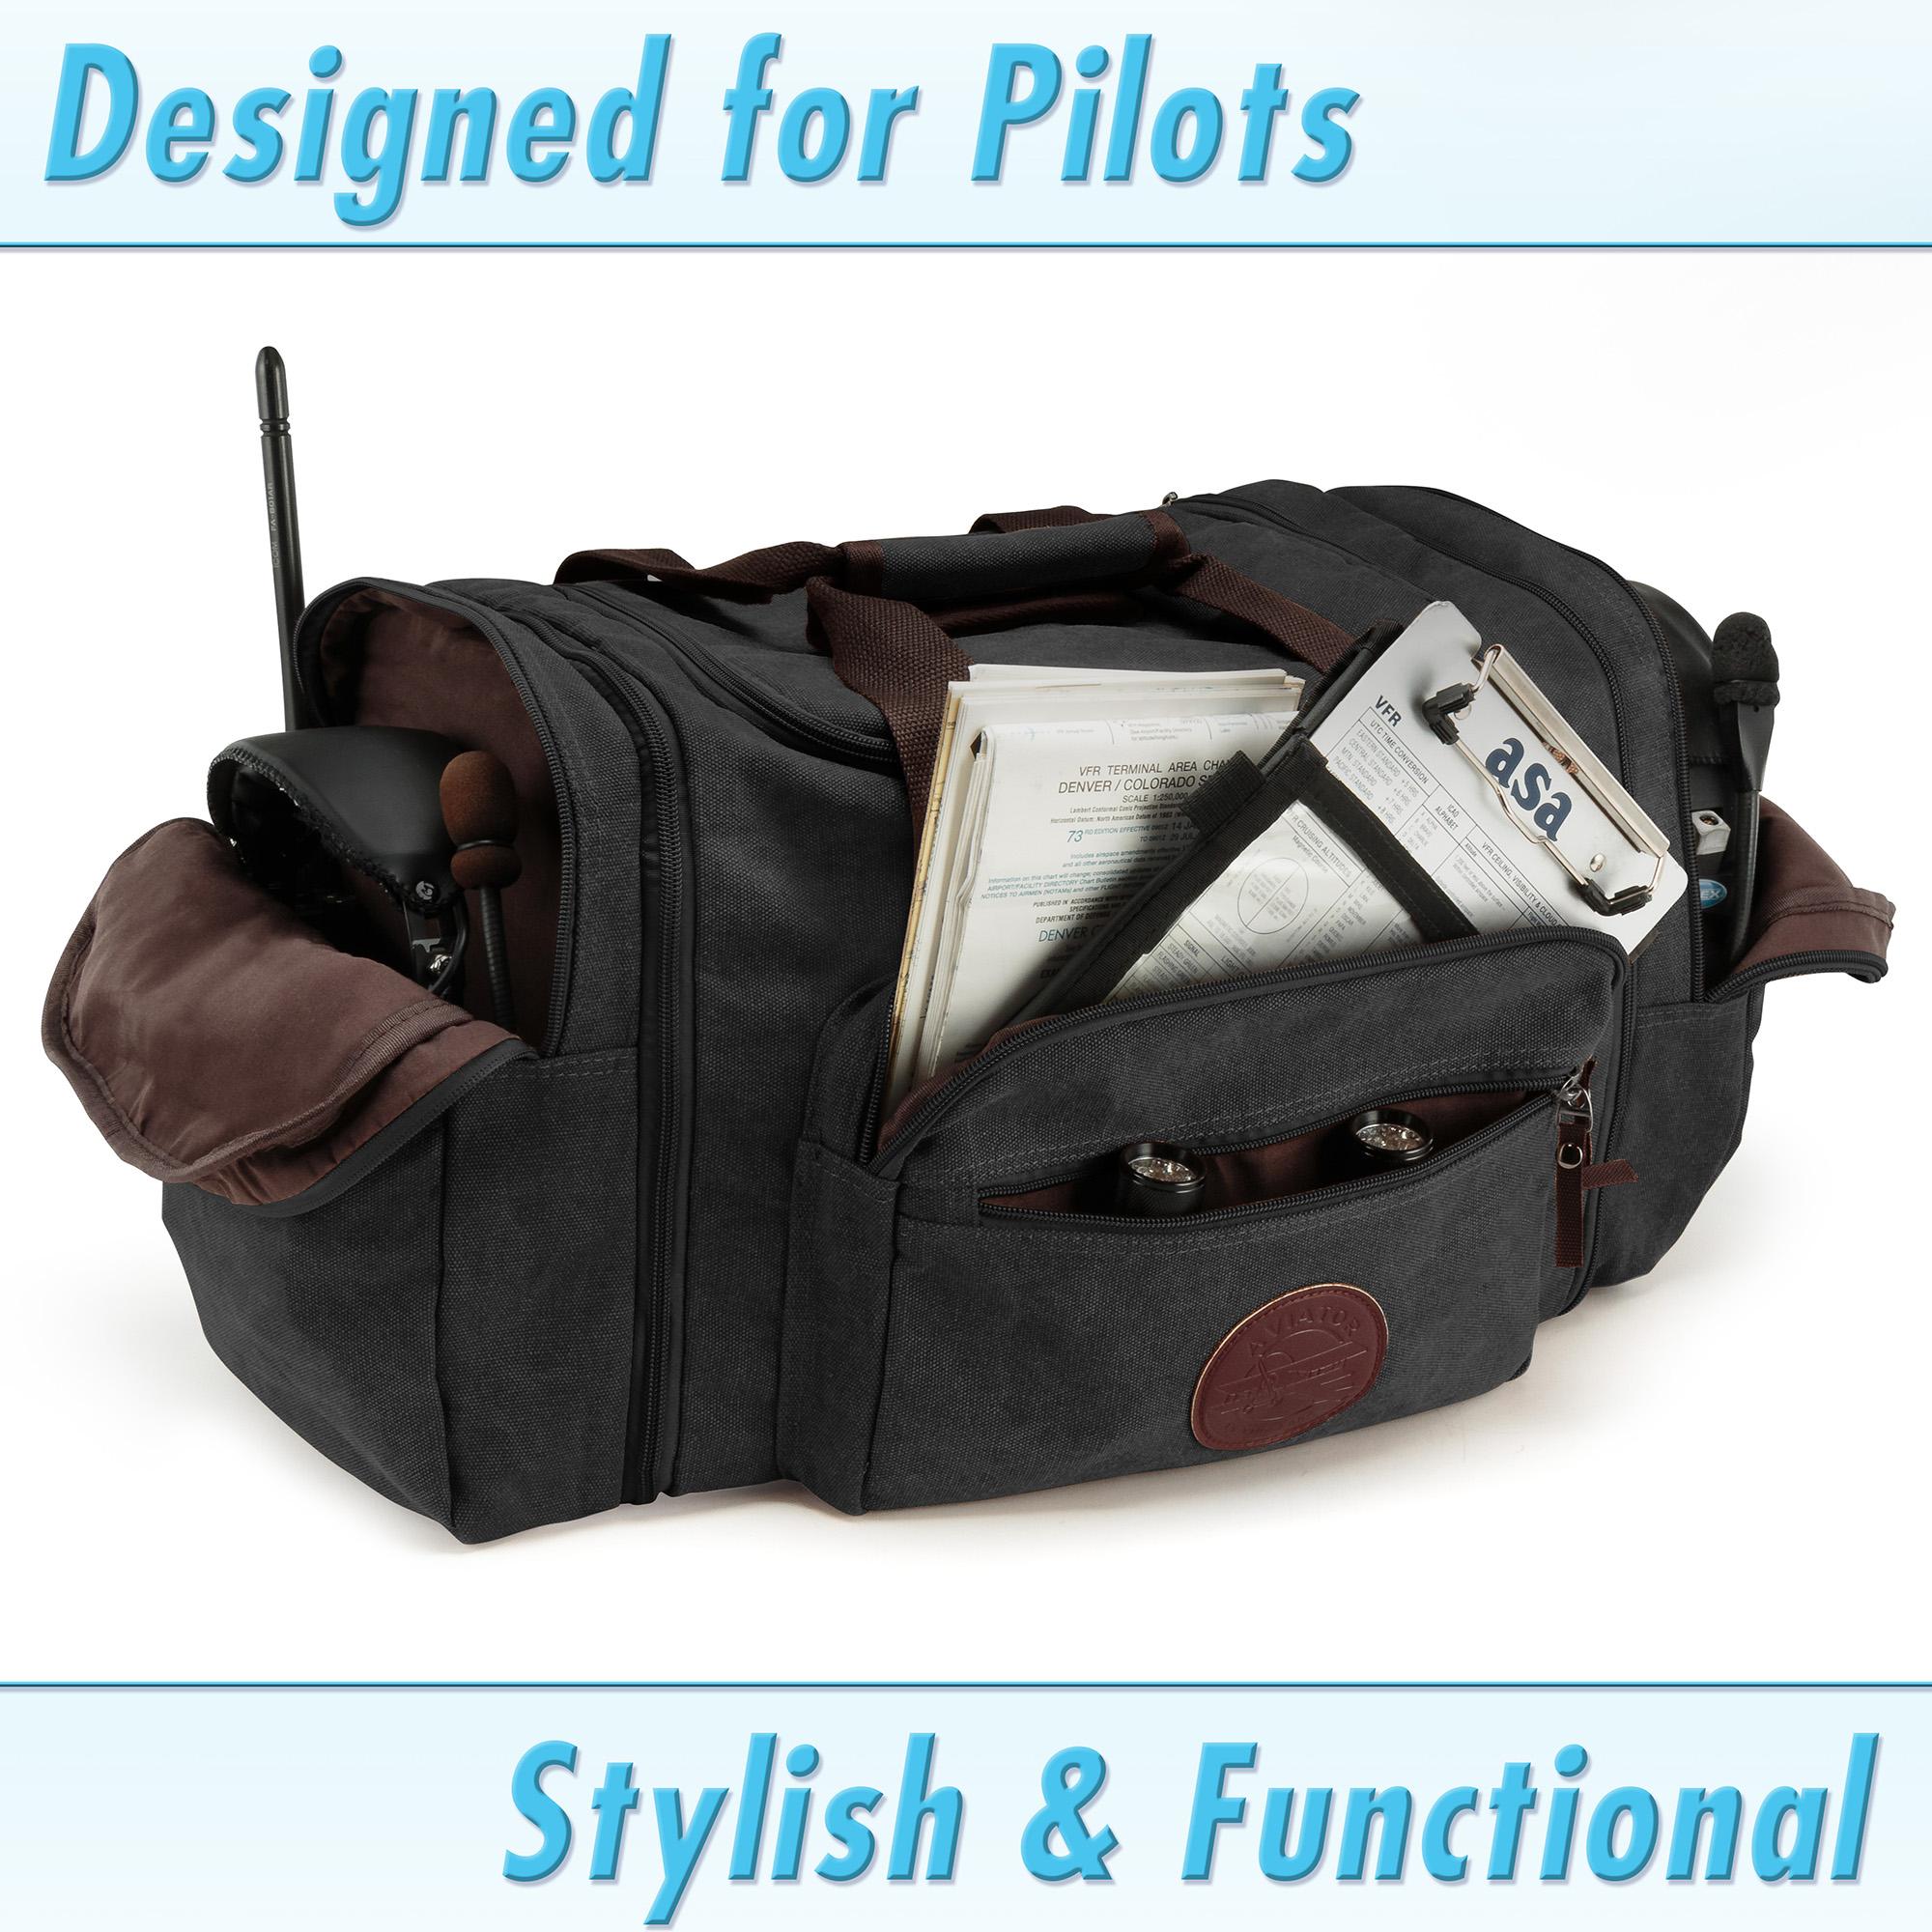 Deluxe Flight Bag by KMD AERO Multipurpose Travel Duffel Tote Bags ... 9fc47b12f7478